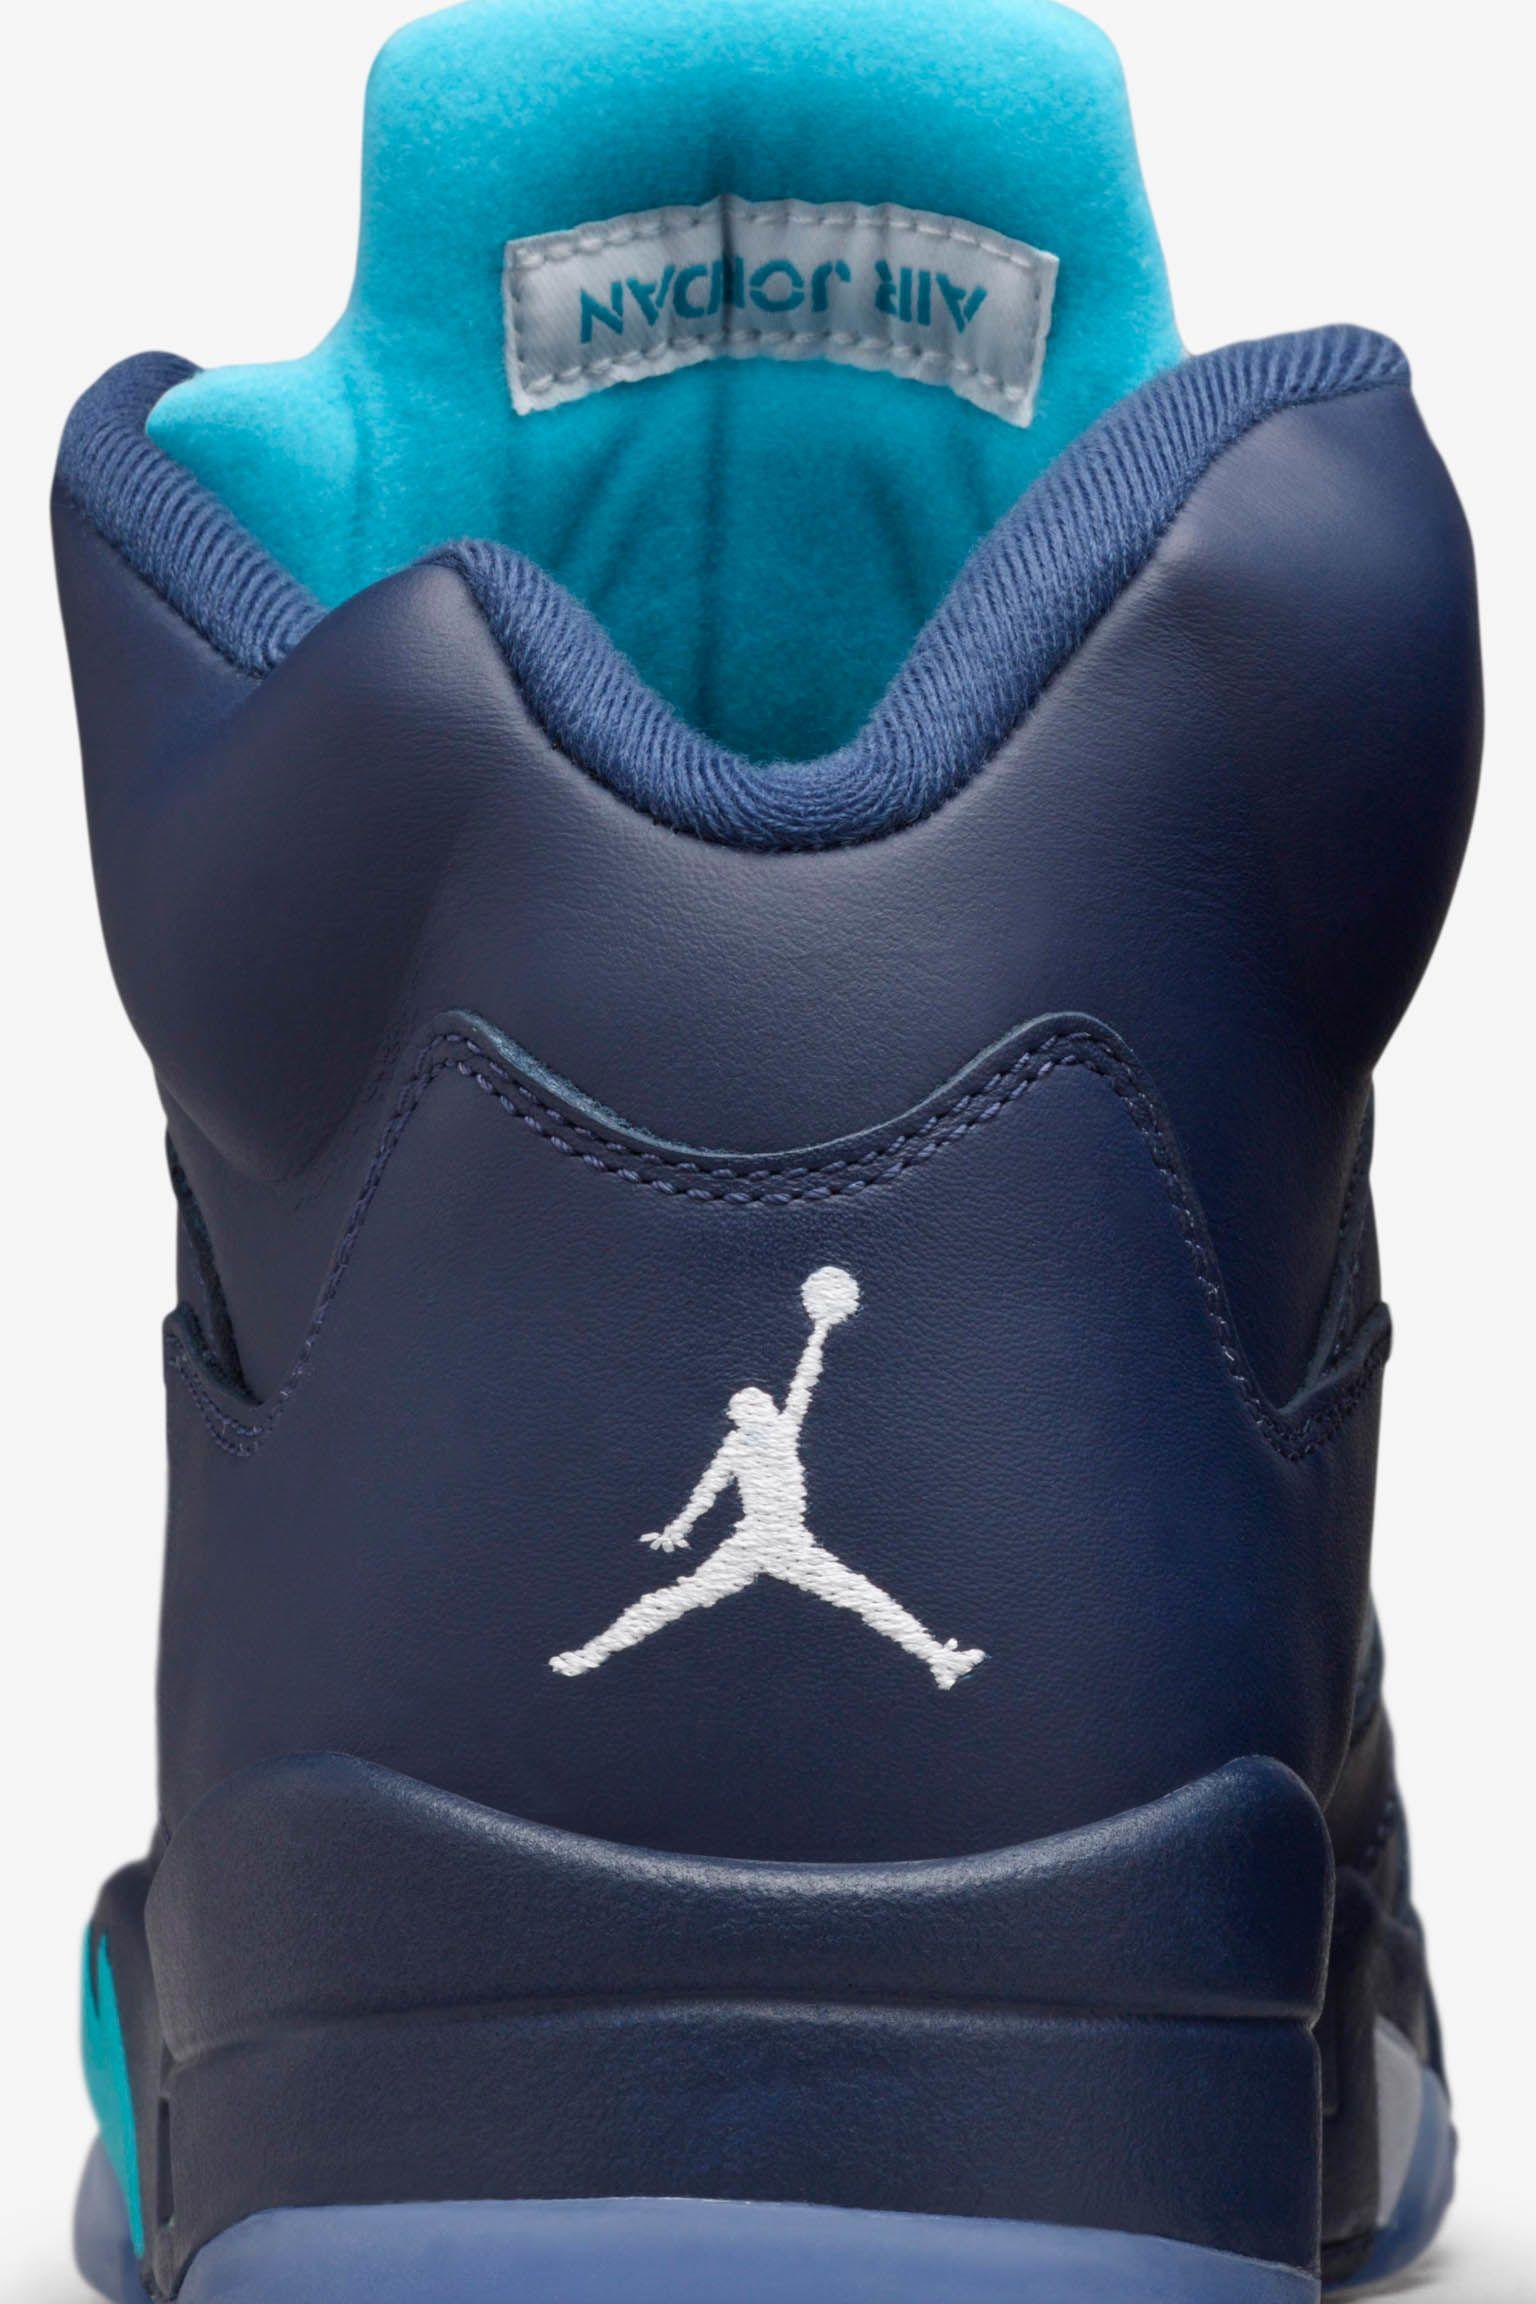 Air Jordan 5 Retro 'Pre-Grape' Release Date